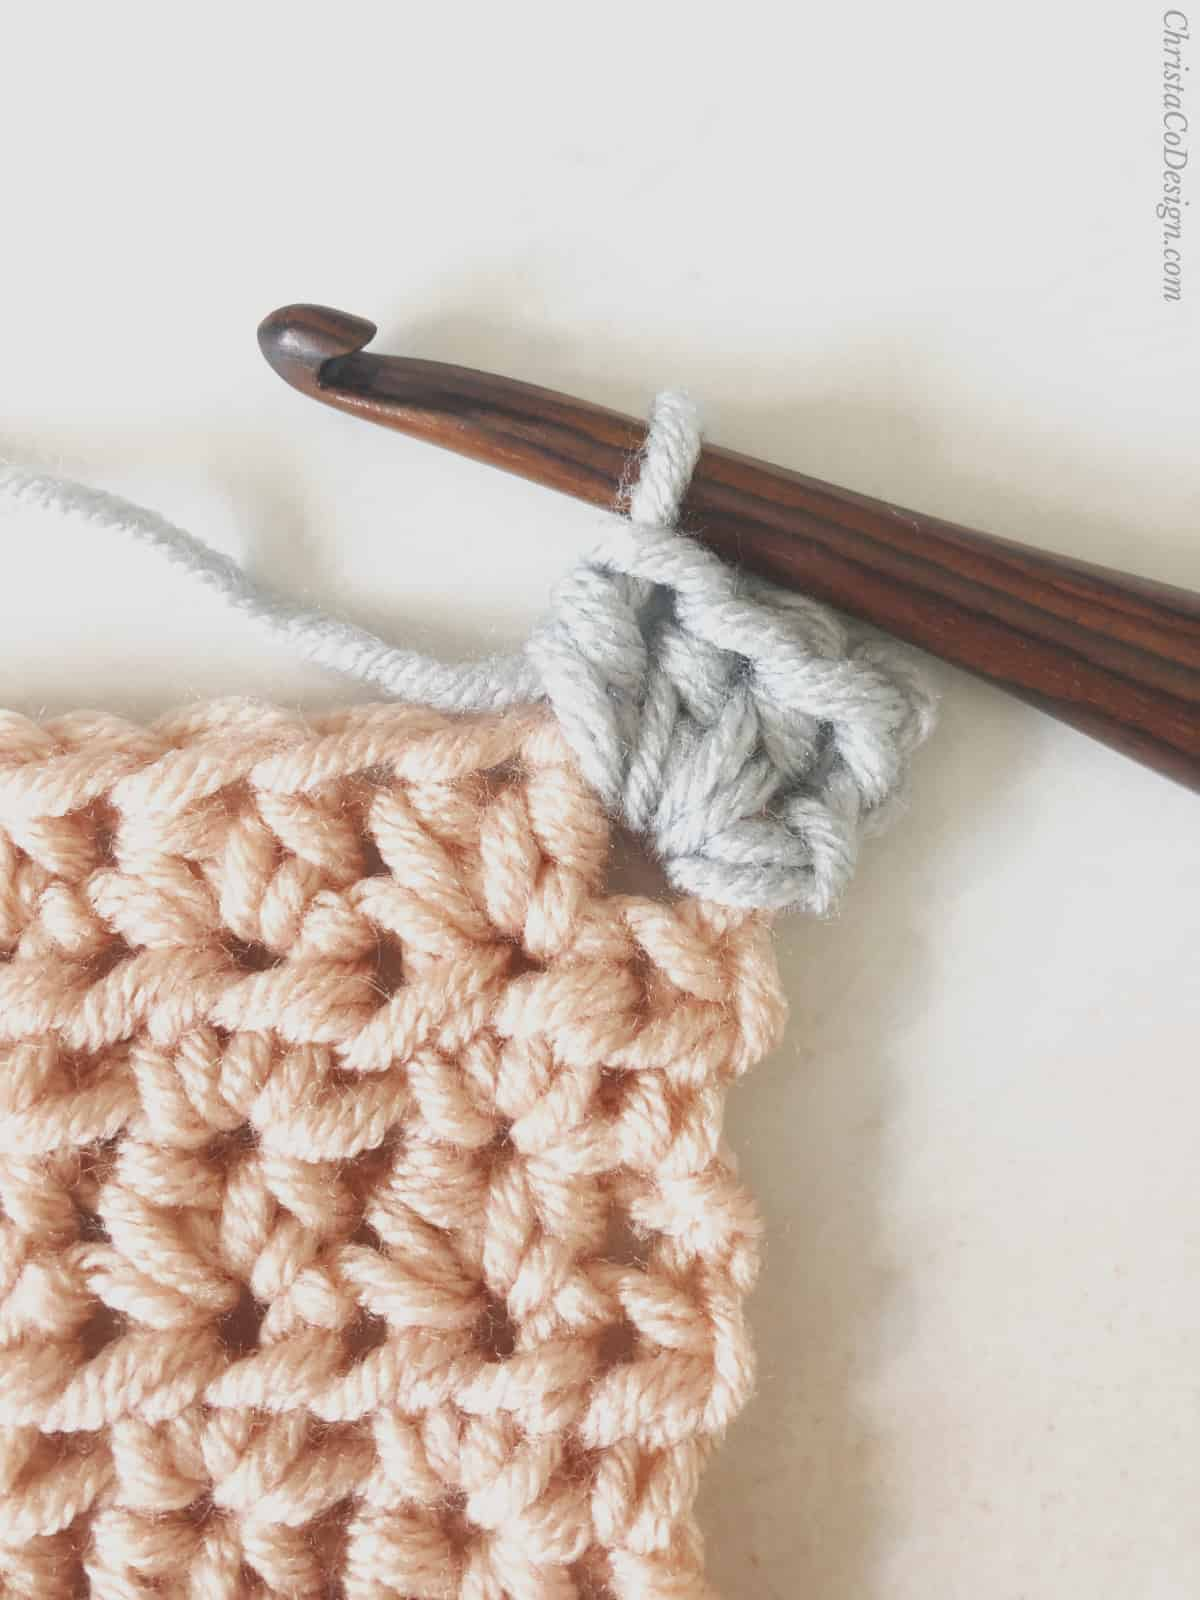 picture of corner stitches crochet border on blanket